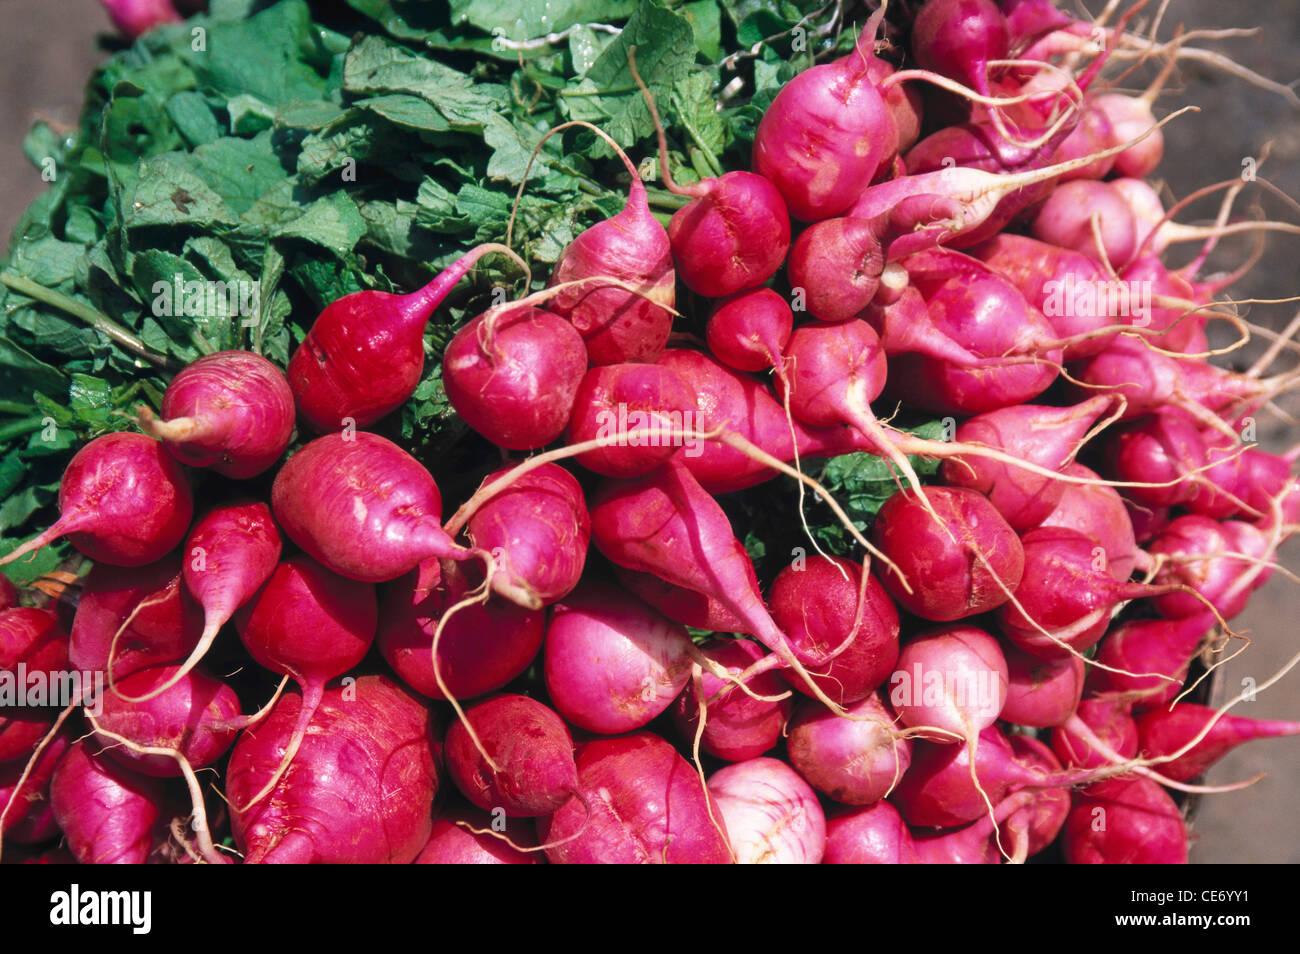 MMN 83851 : Hortalizas montón de nabo rojo Imagen De Stock